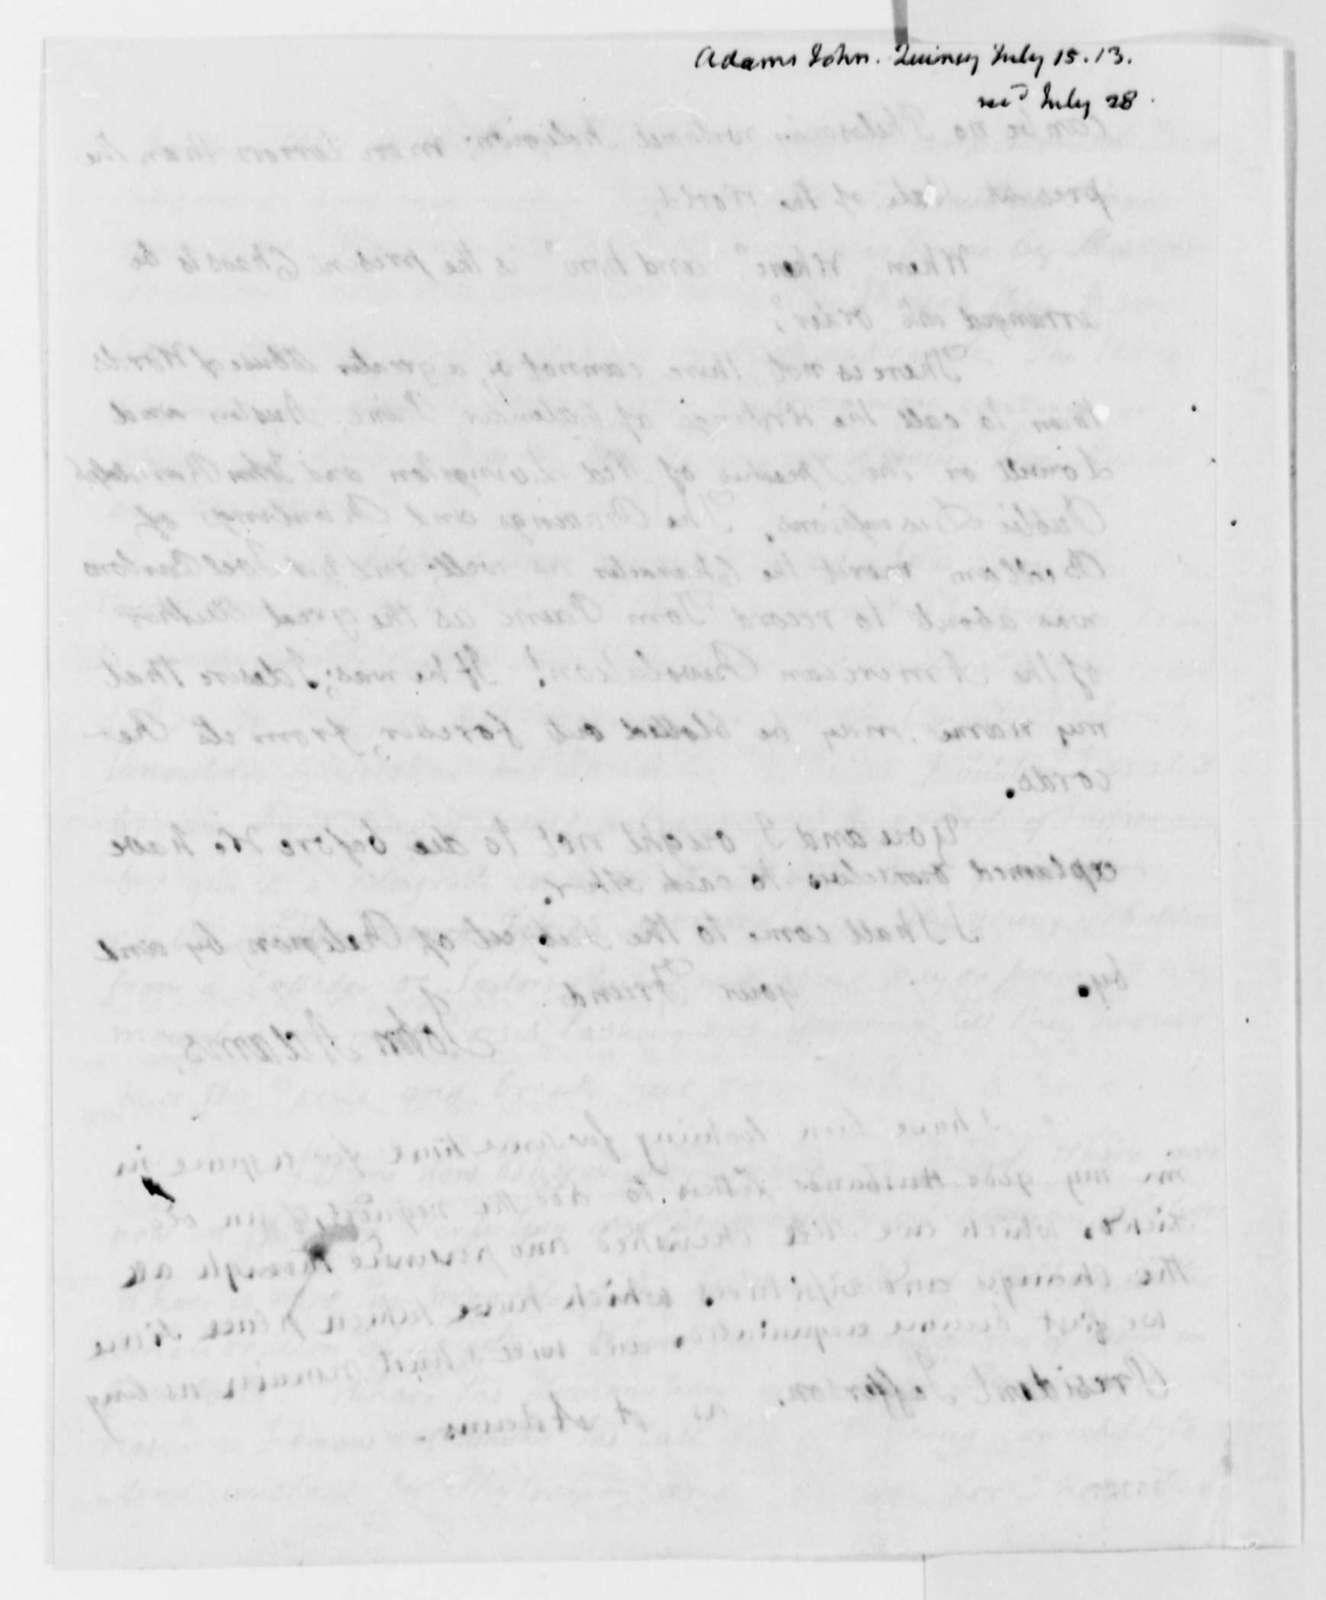 John Adams to Thomas Jefferson, July 15, 1813